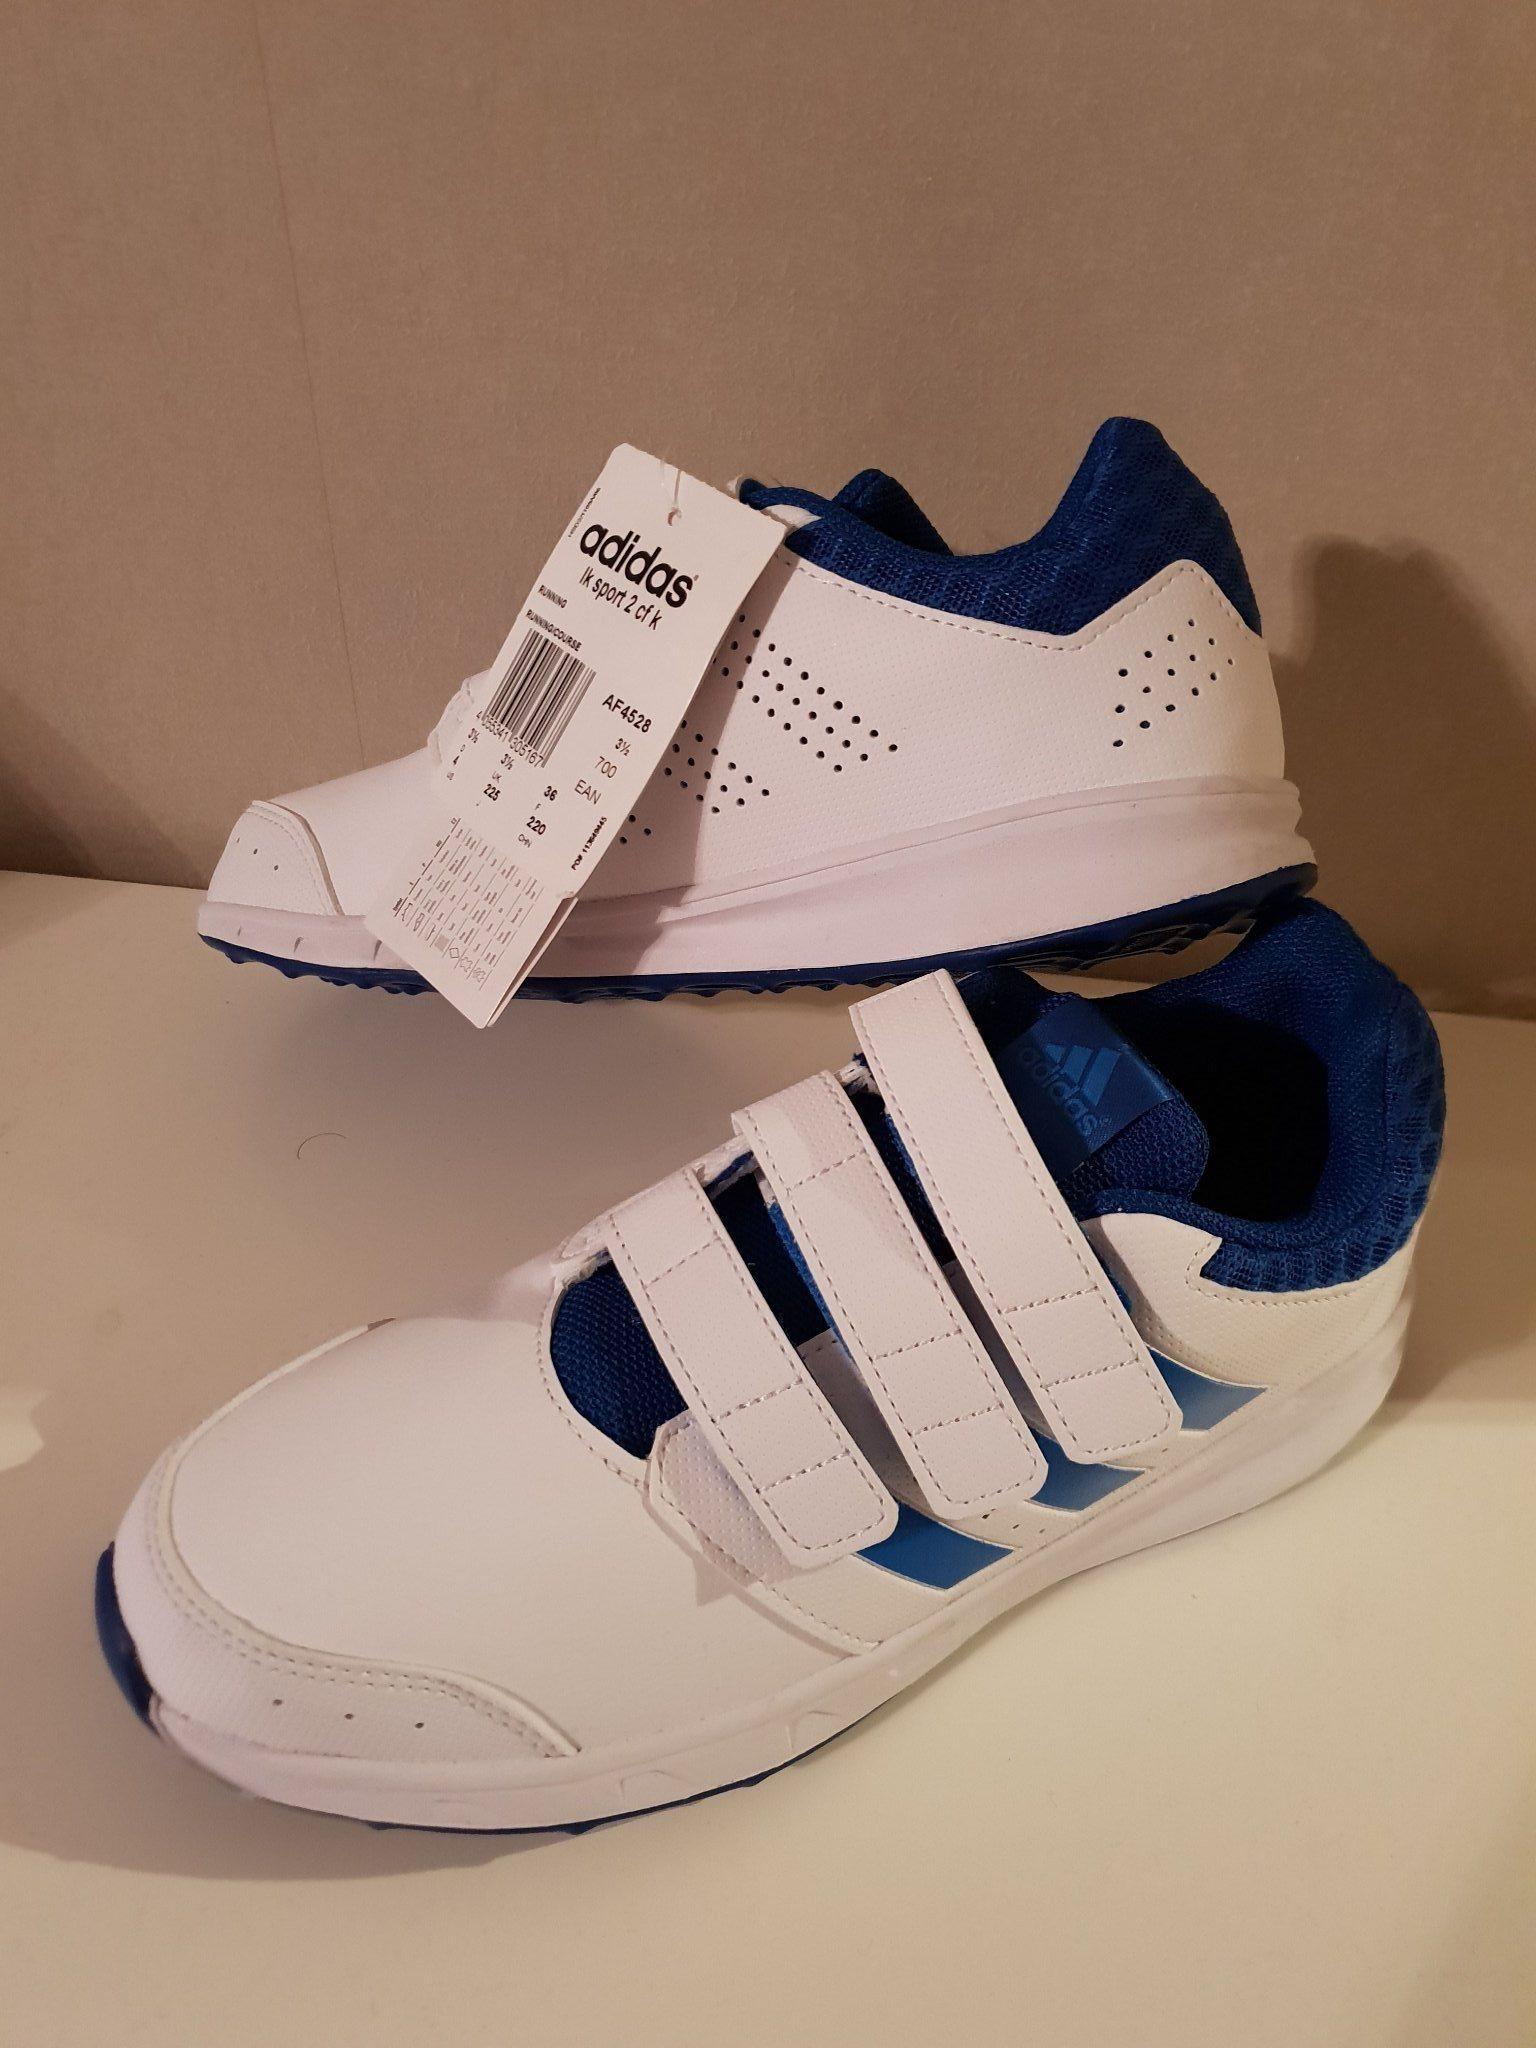 brand new 3450b 3448c Nya Adidas skor.